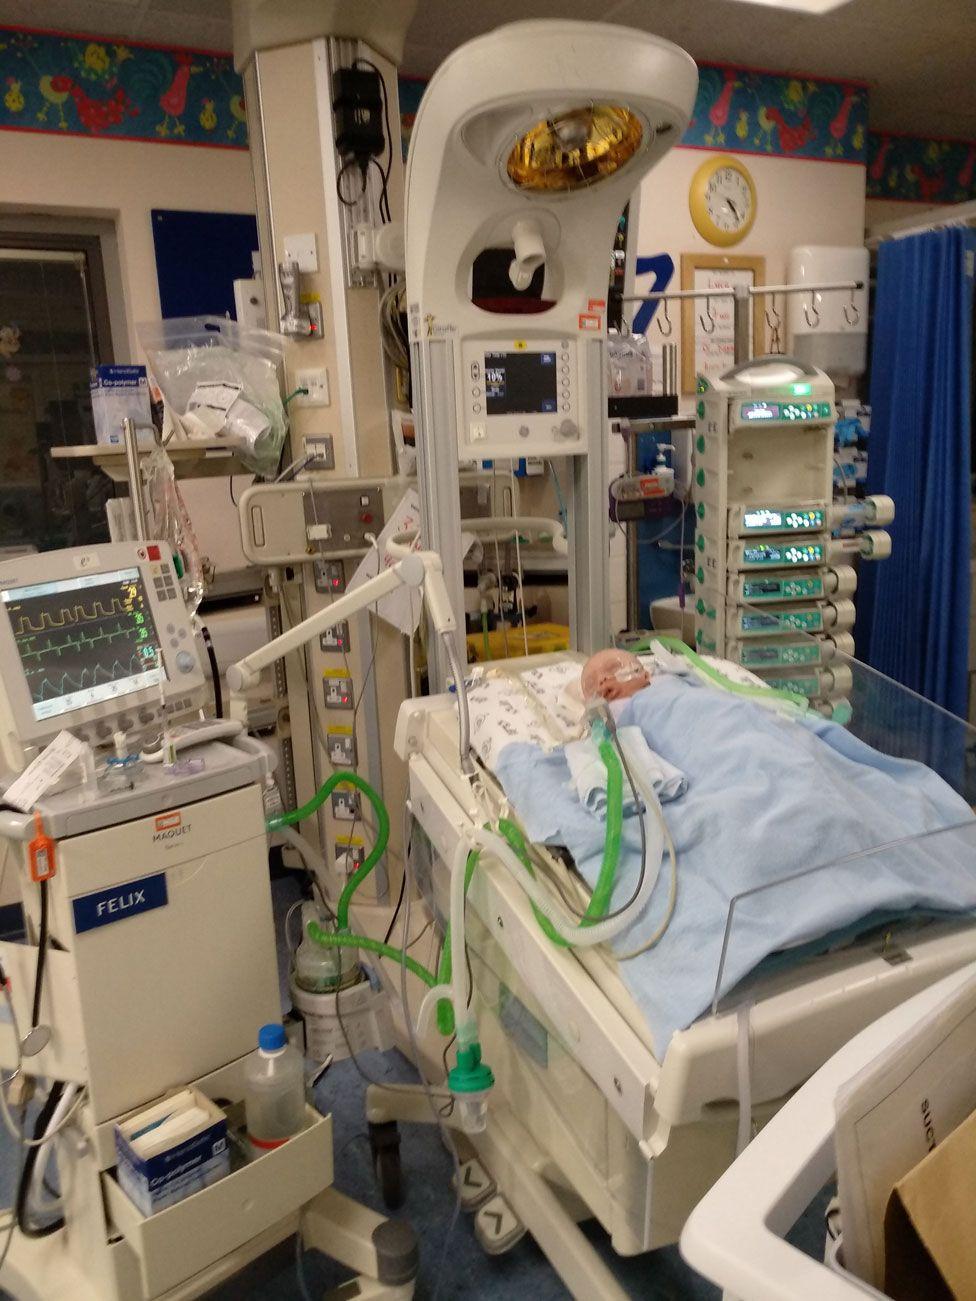 Luca in intensive care